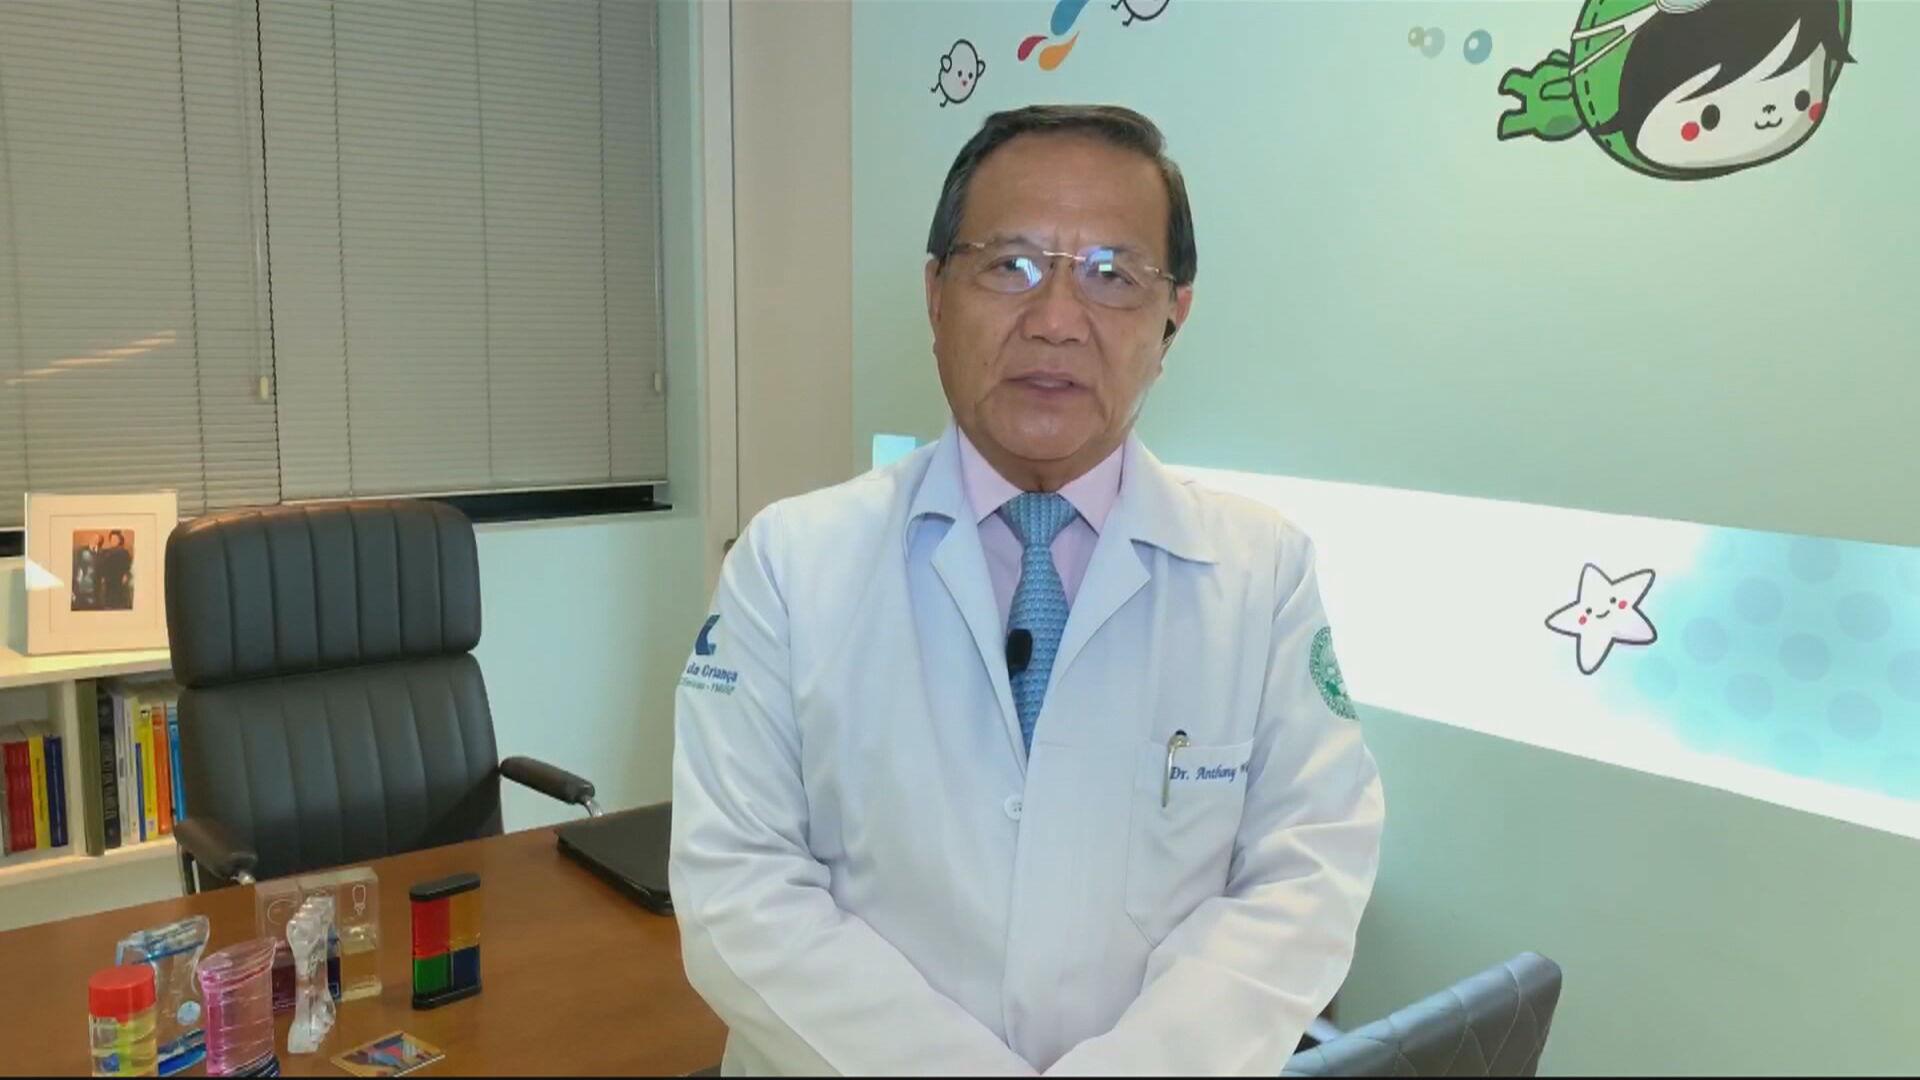 Morre o pediatra e toxicologista Anthony Wong